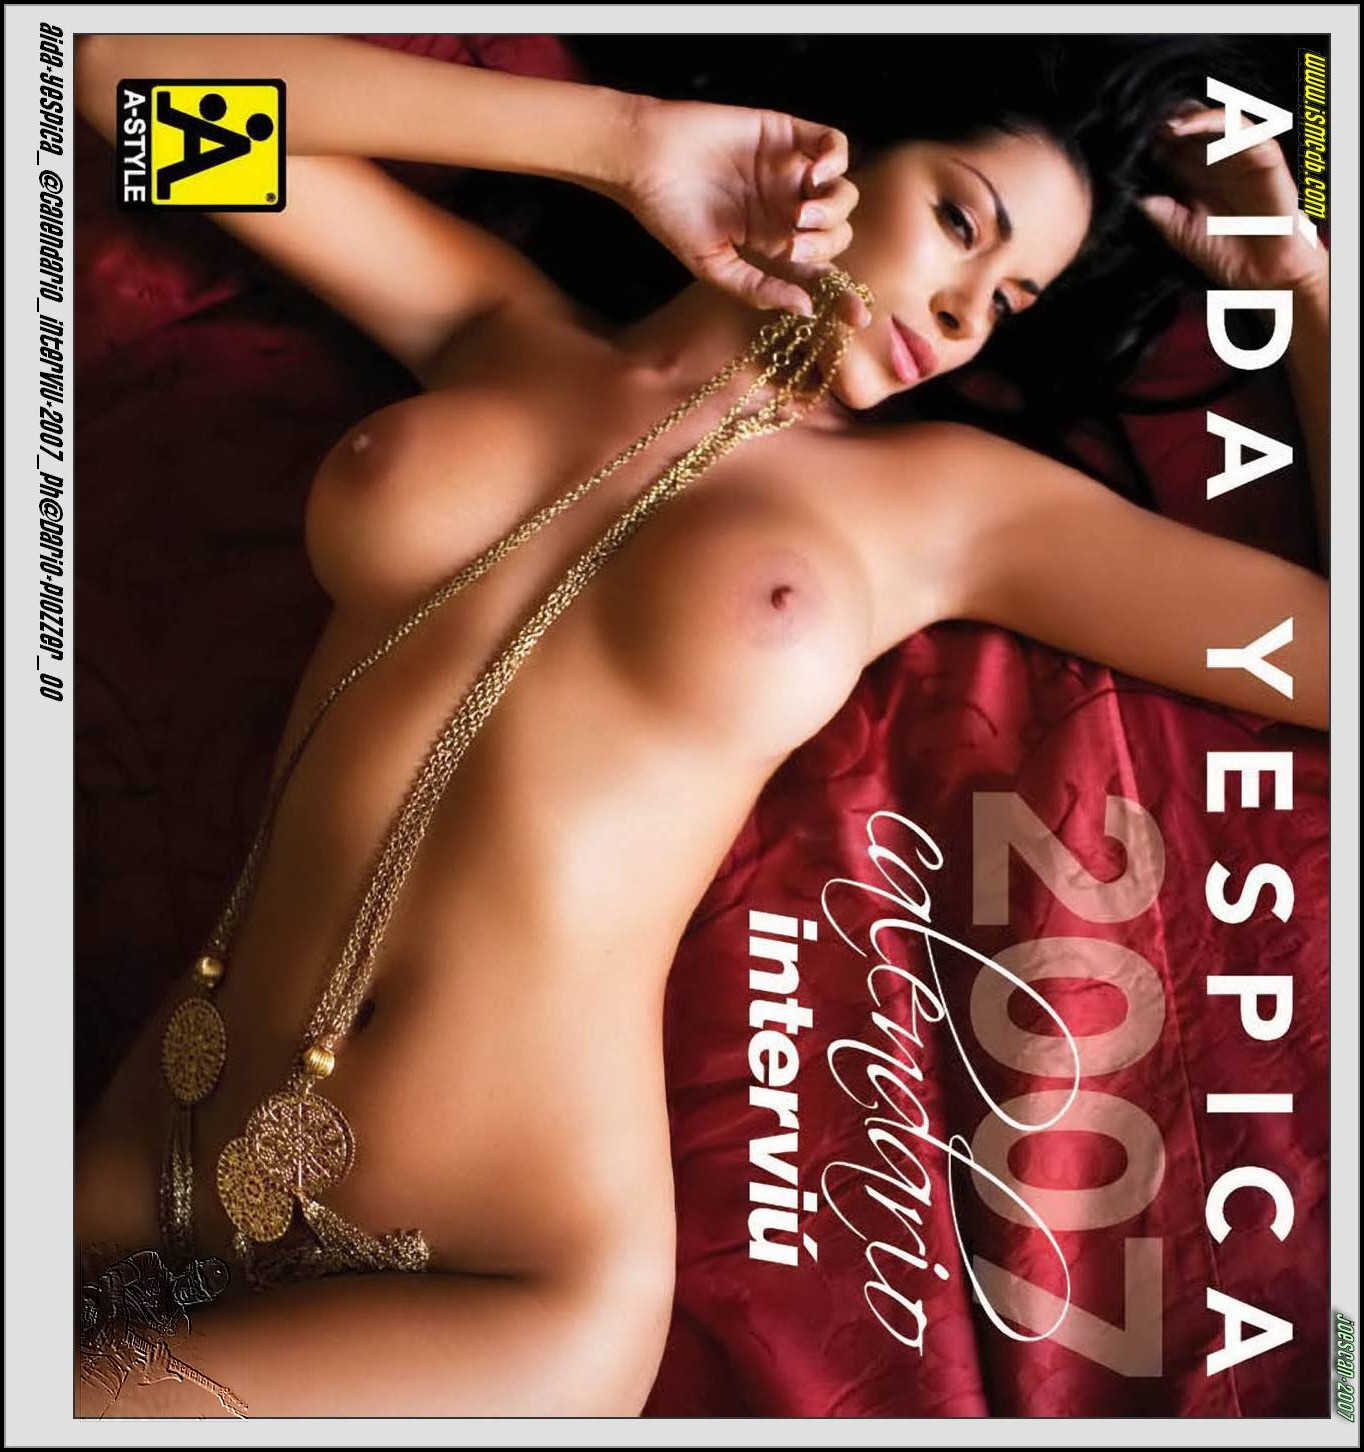 Aida Yespica Calendar 2008 photoshoot front cover